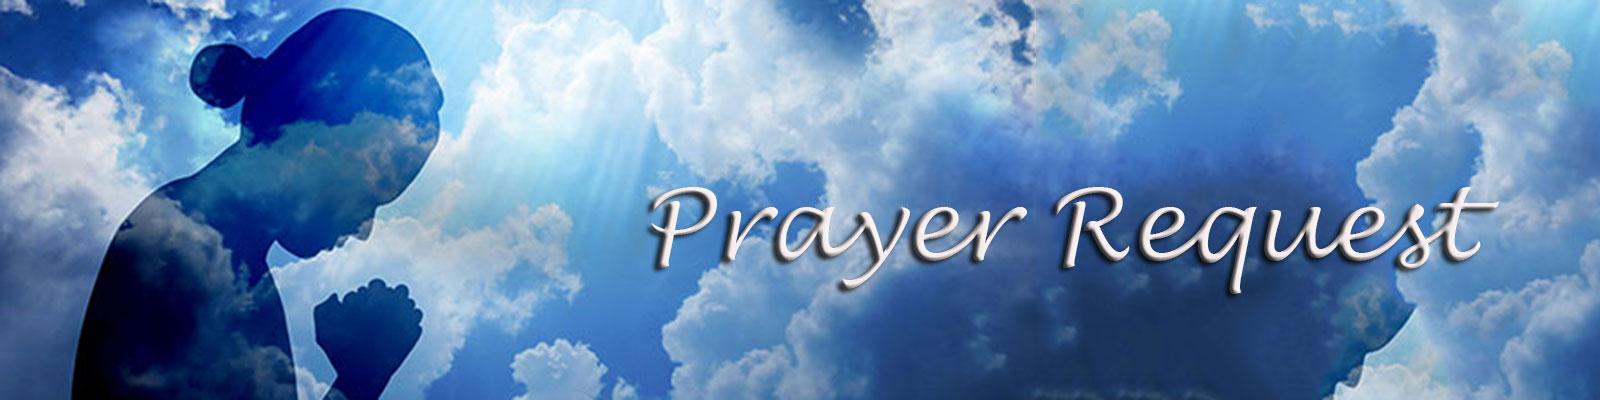 prayer-request2